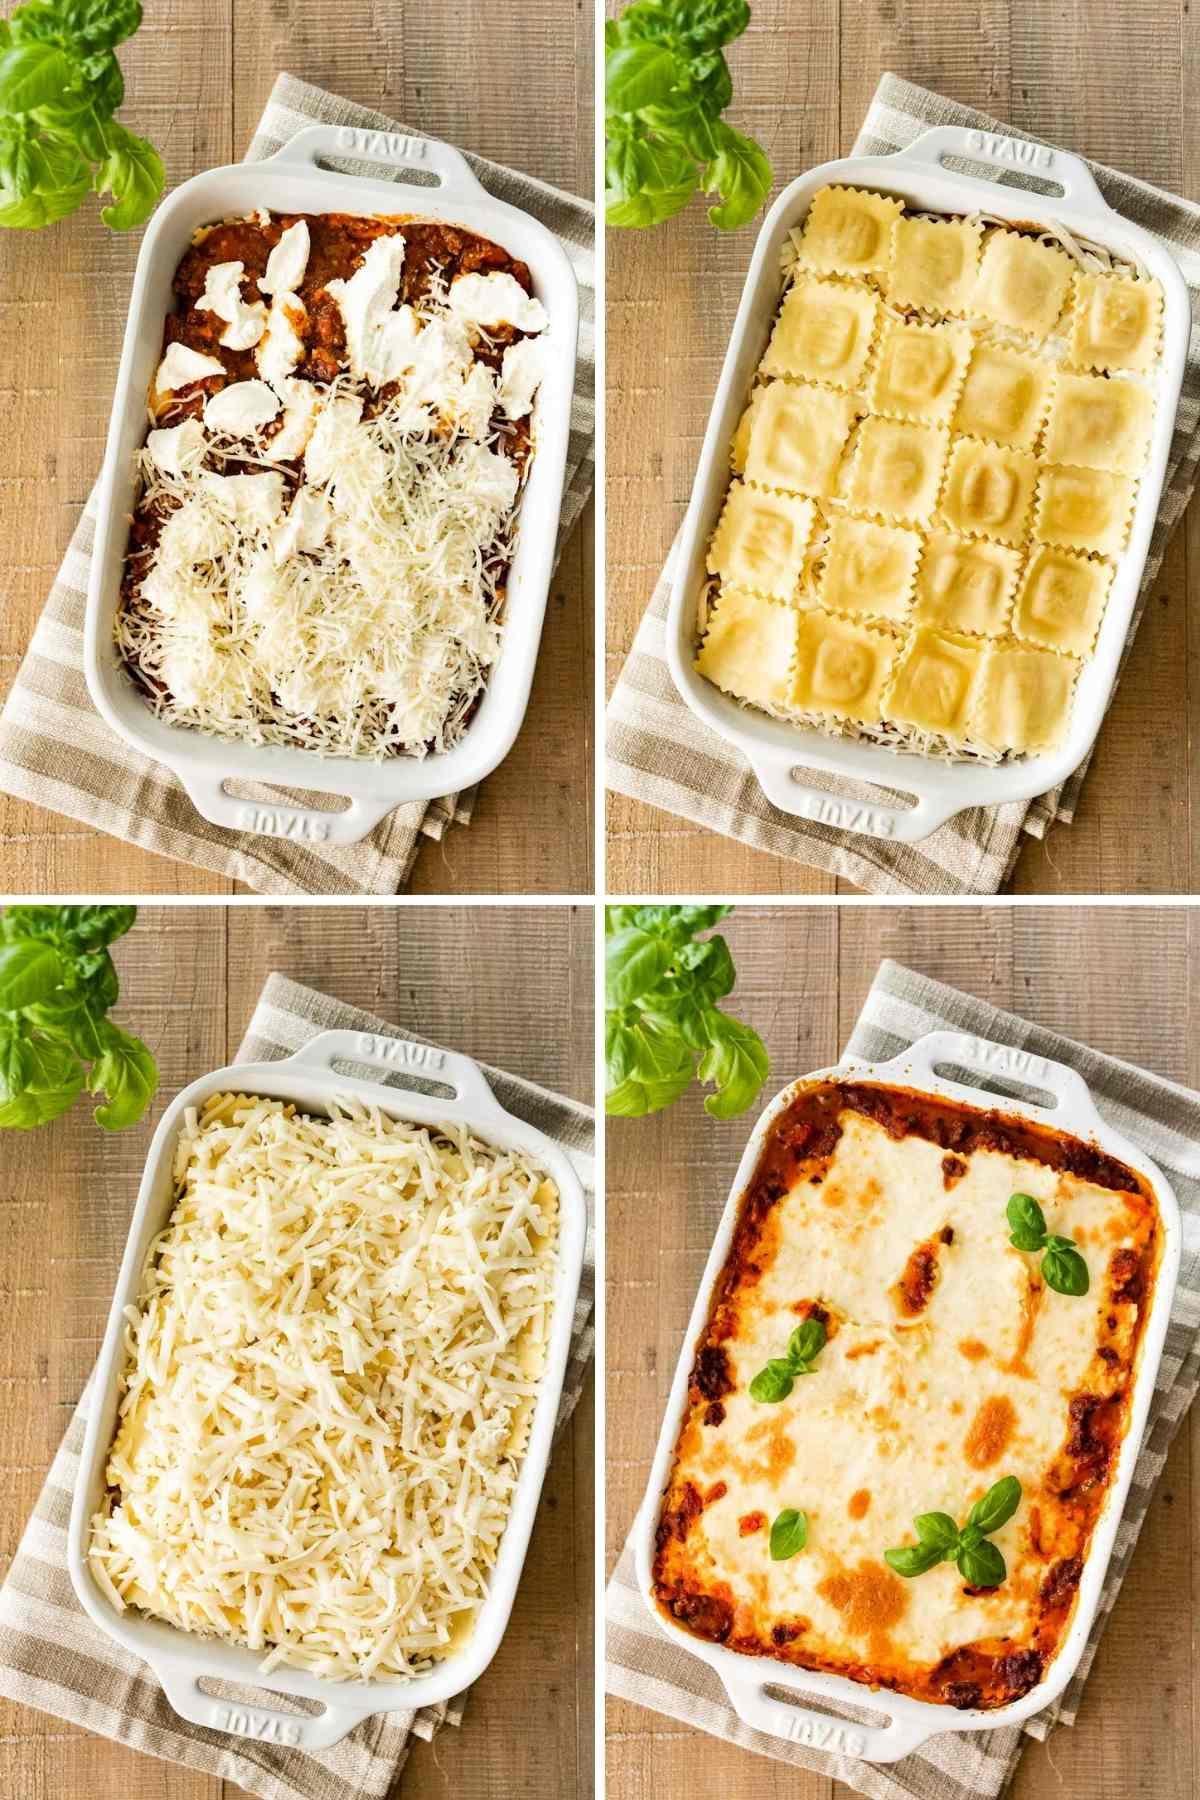 Ravioli Lasagna Bake layers in baking dish